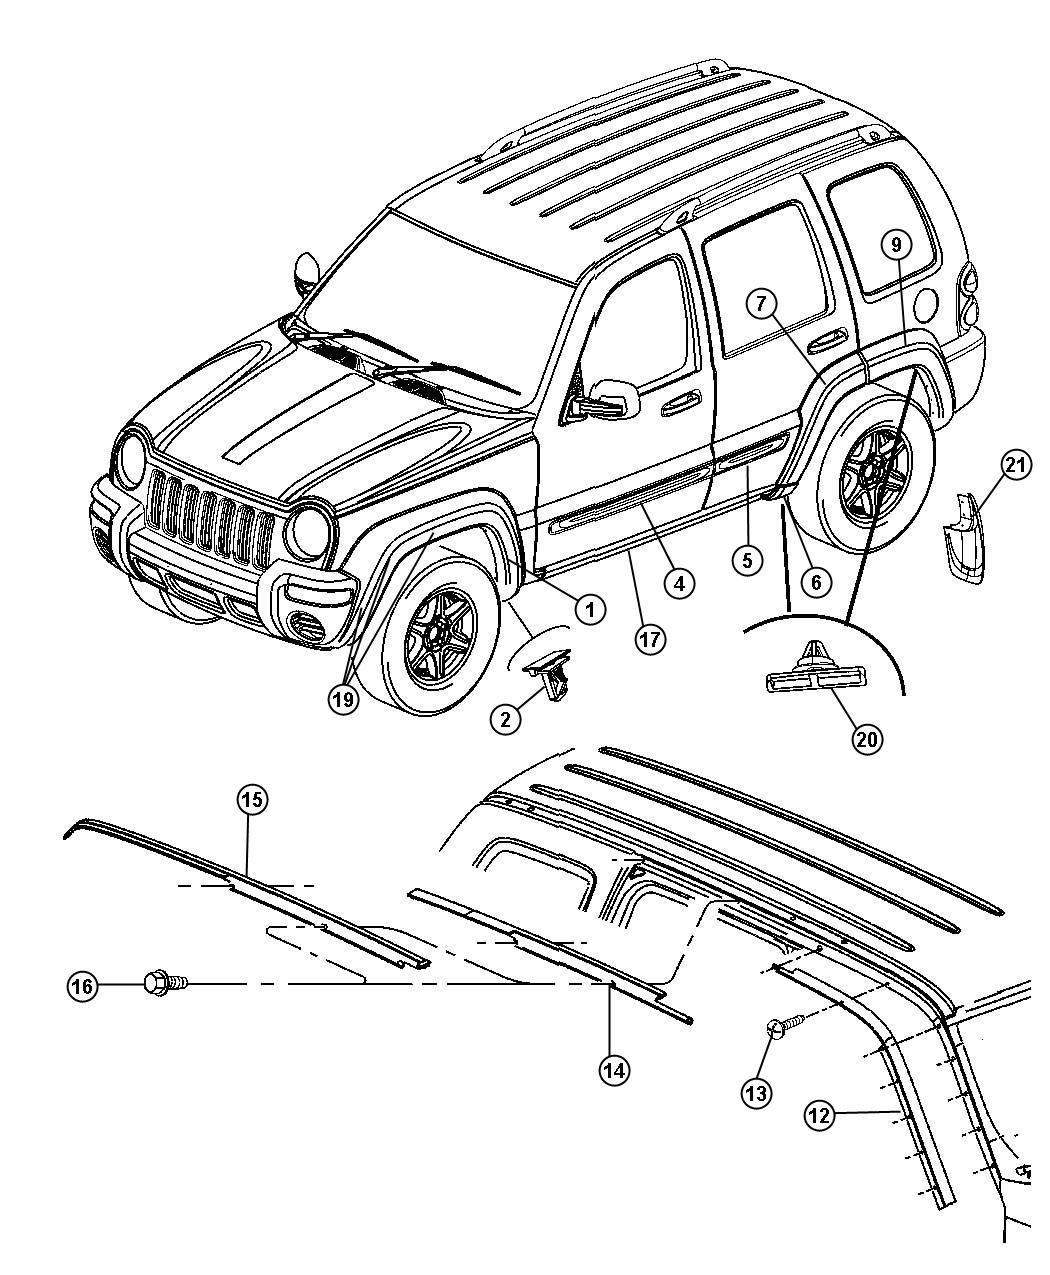 2004 Jeep Liberty Engine Diagram